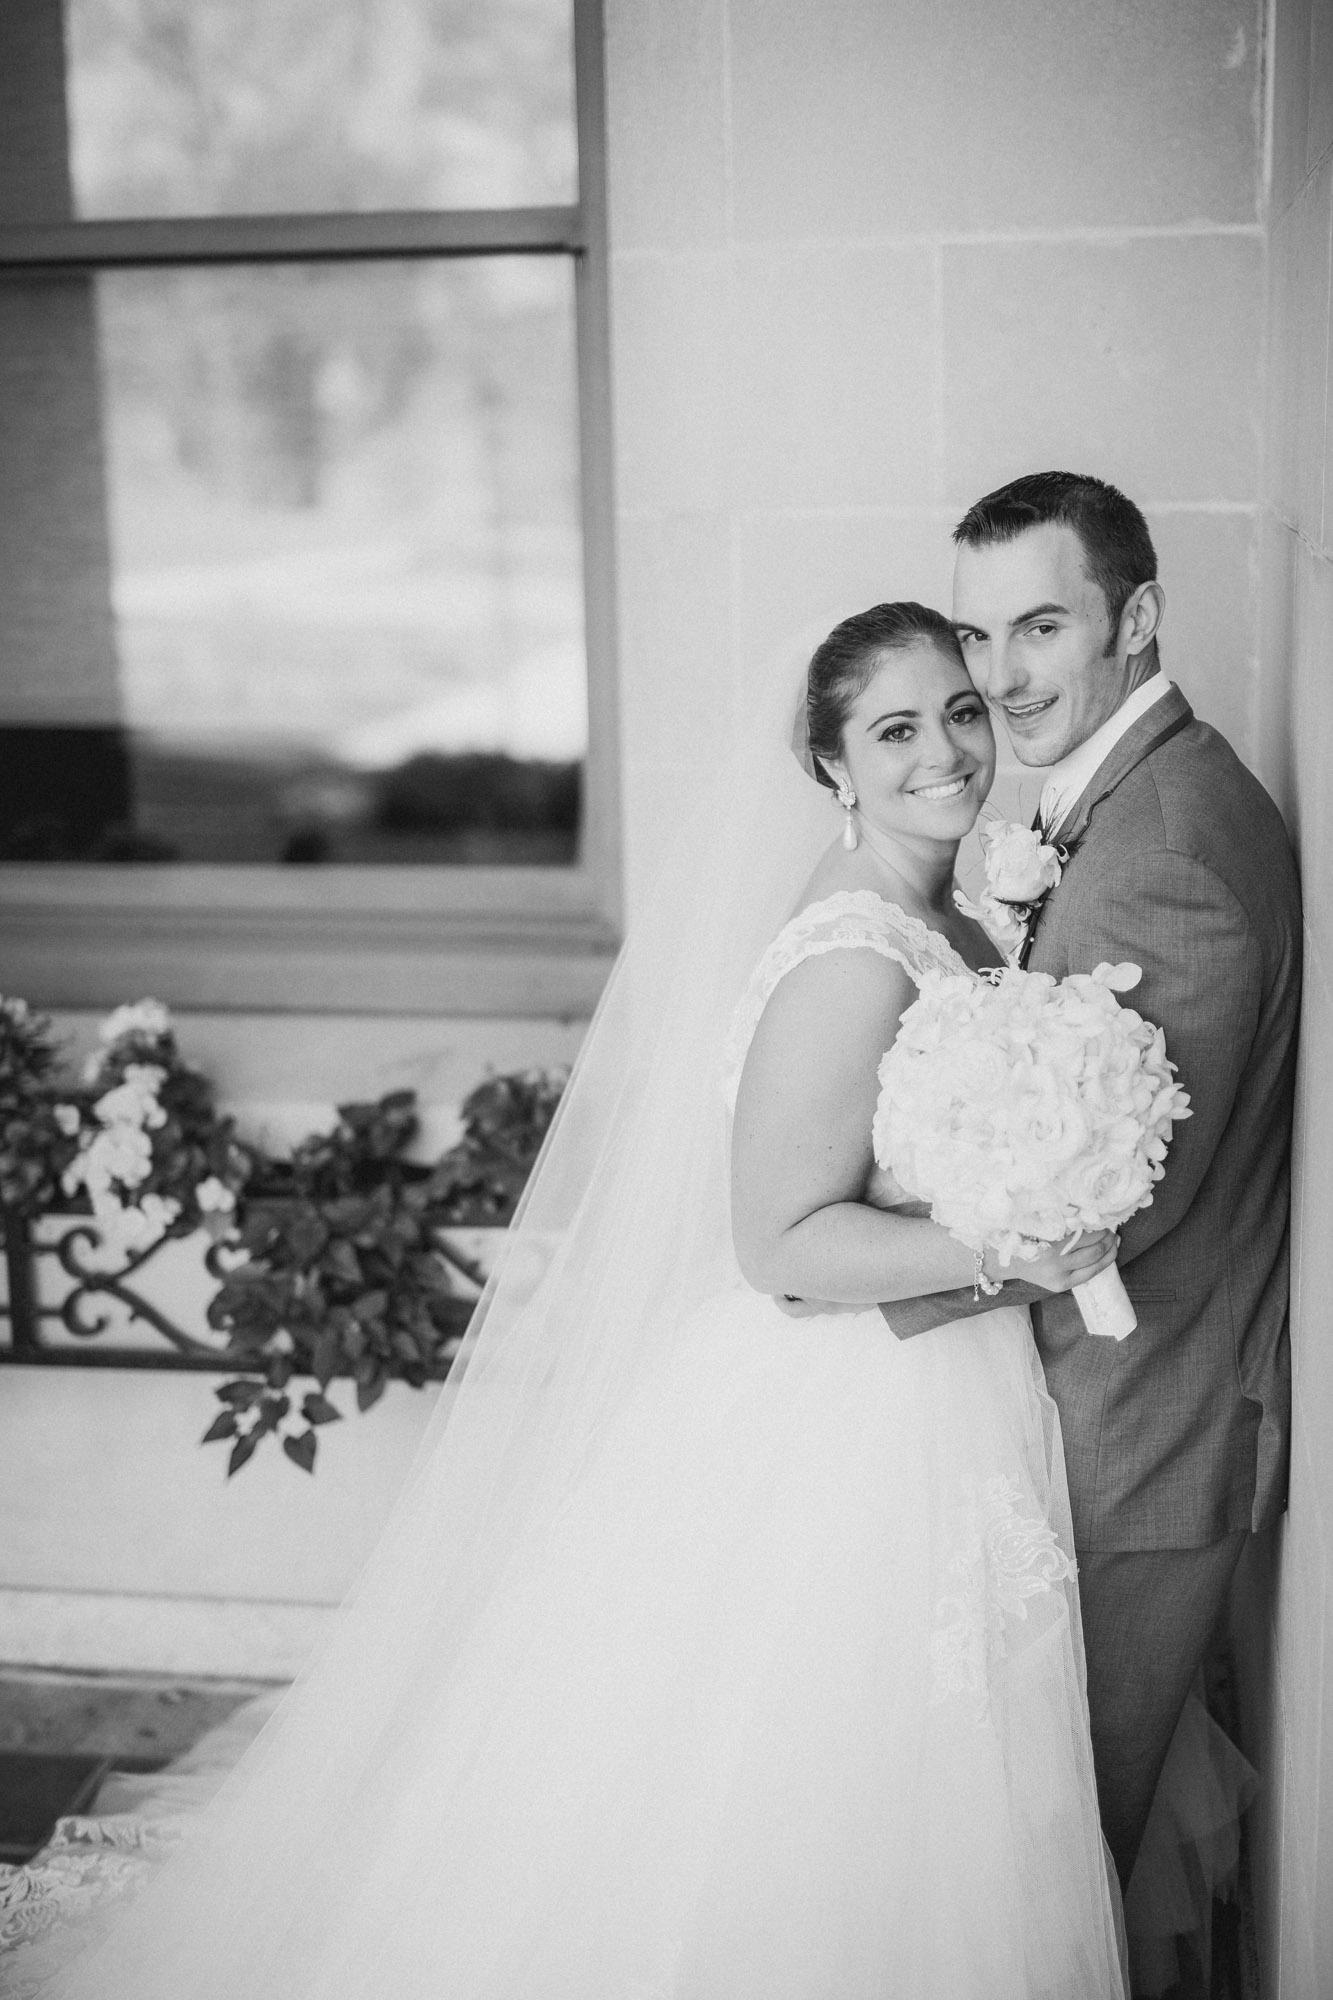 Mike & Danielle's Scranton Wedding Photography 55